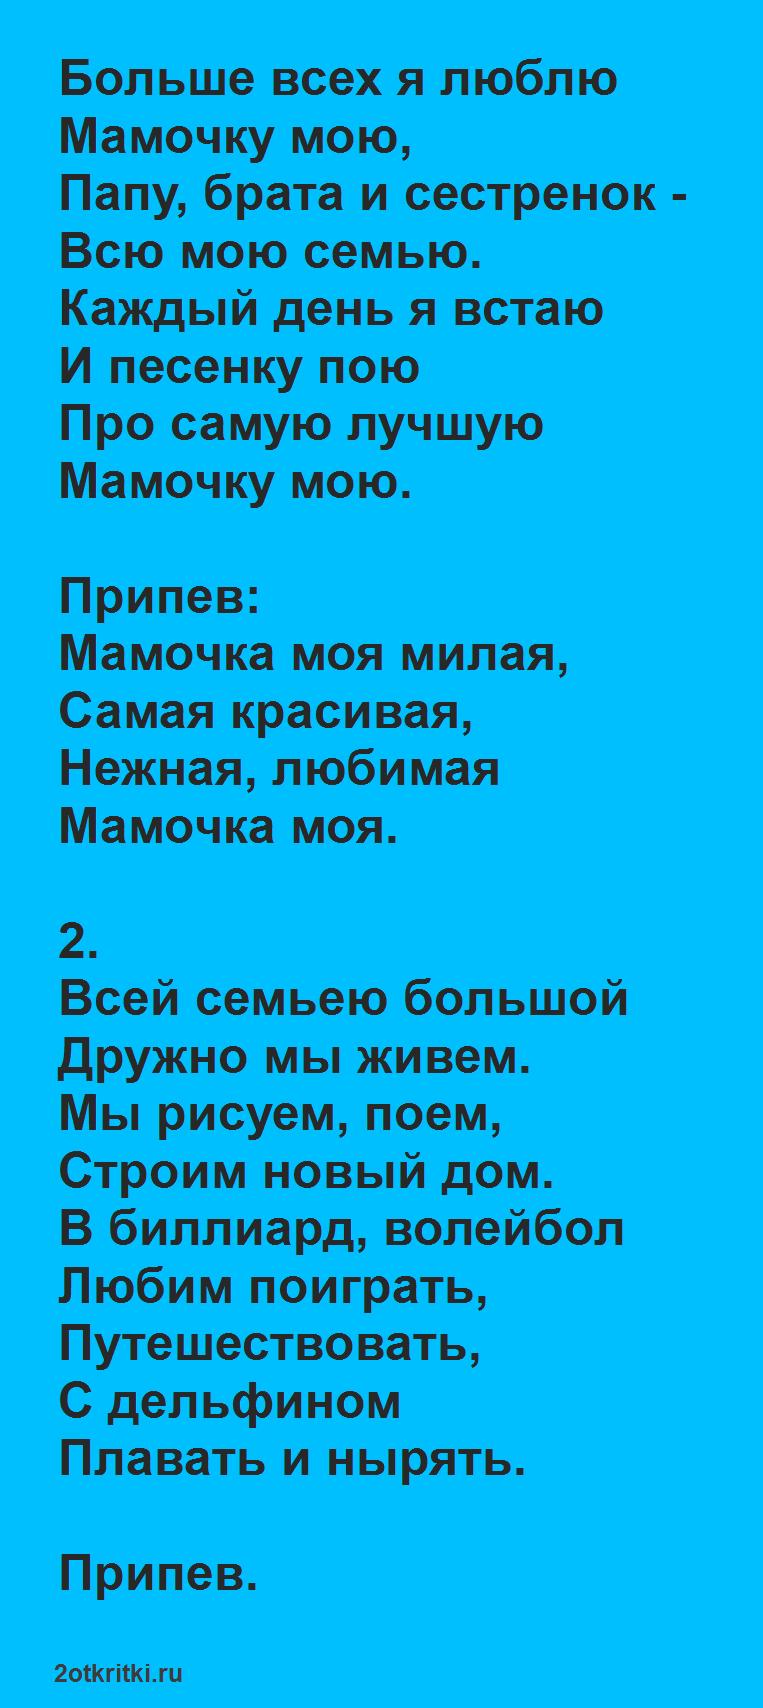 Детские песни на 8 Марта - Мамочка моя